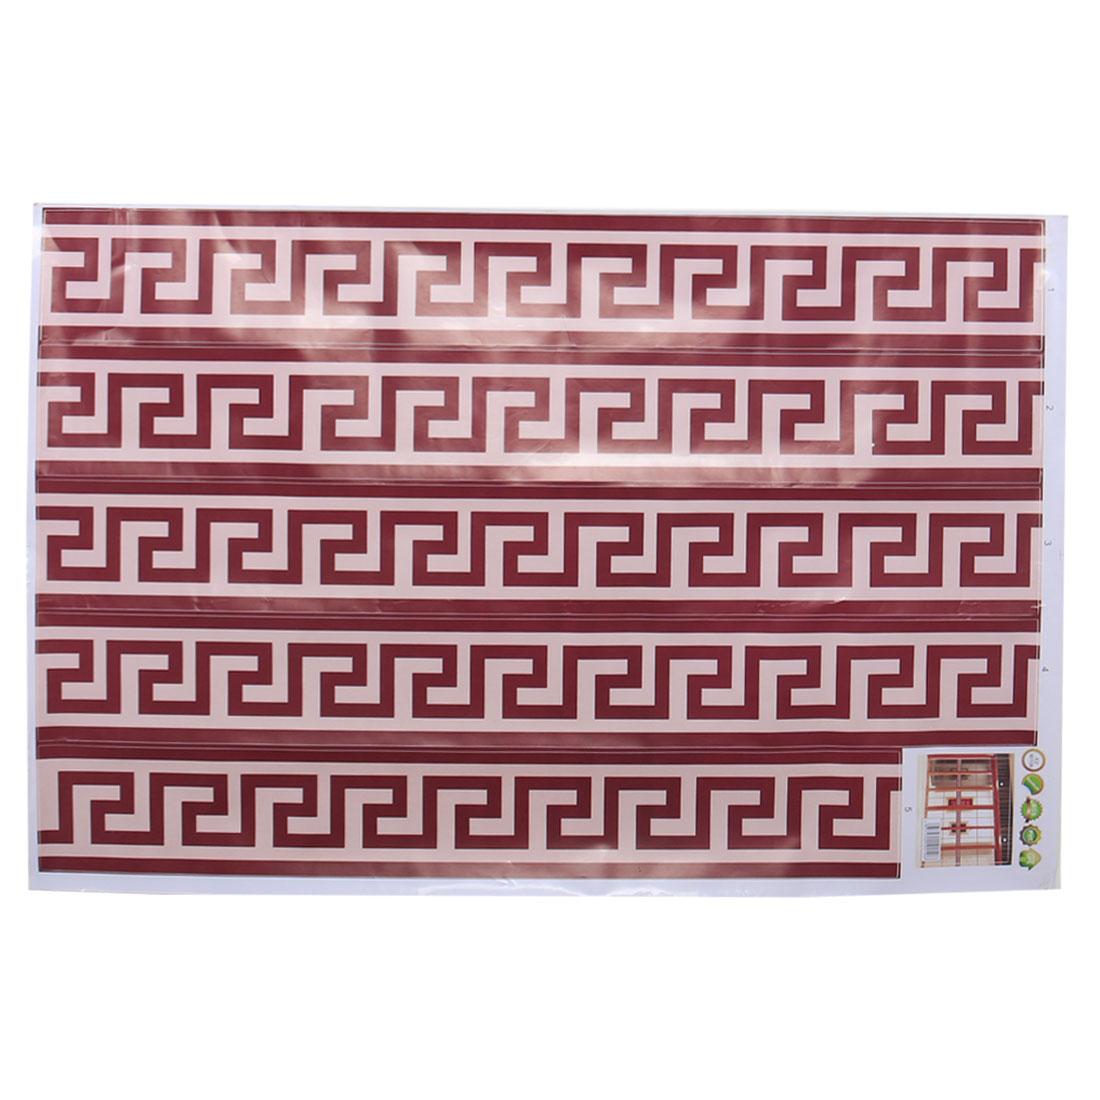 Border Wall Sticker Wall Paper DIY Glass Decals Peel Brown Maze Tile Sticker